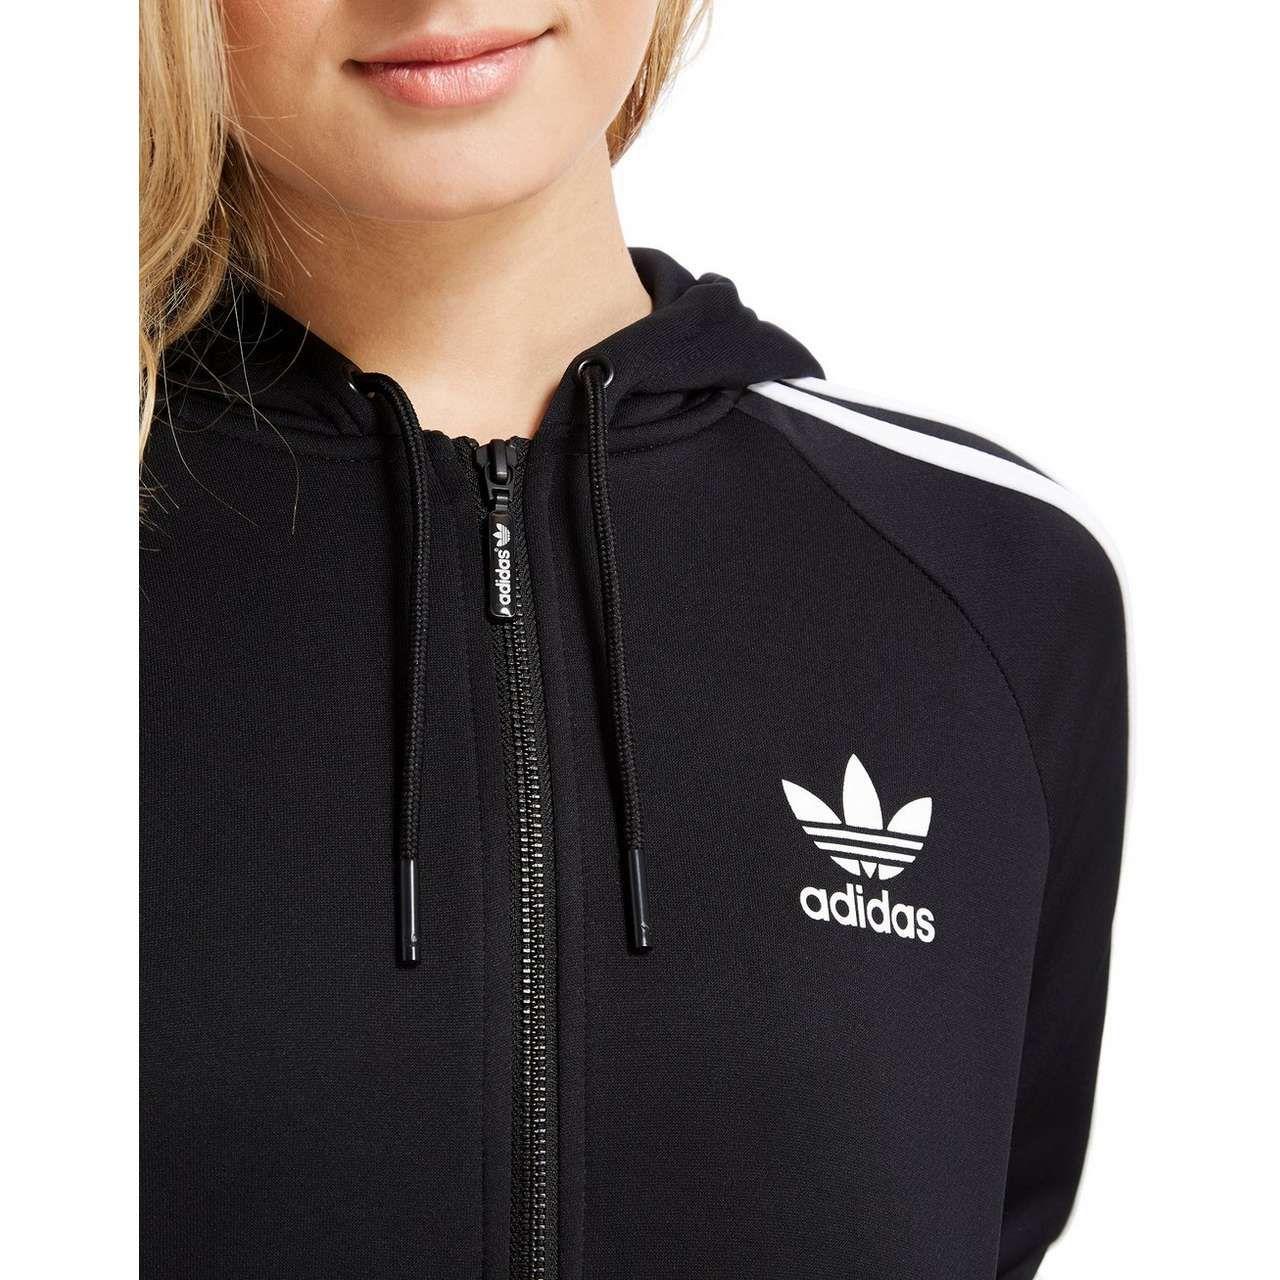 05652522 adidas Originals Poly Full Zip Hoody | Clothes wish list | Full zip ...